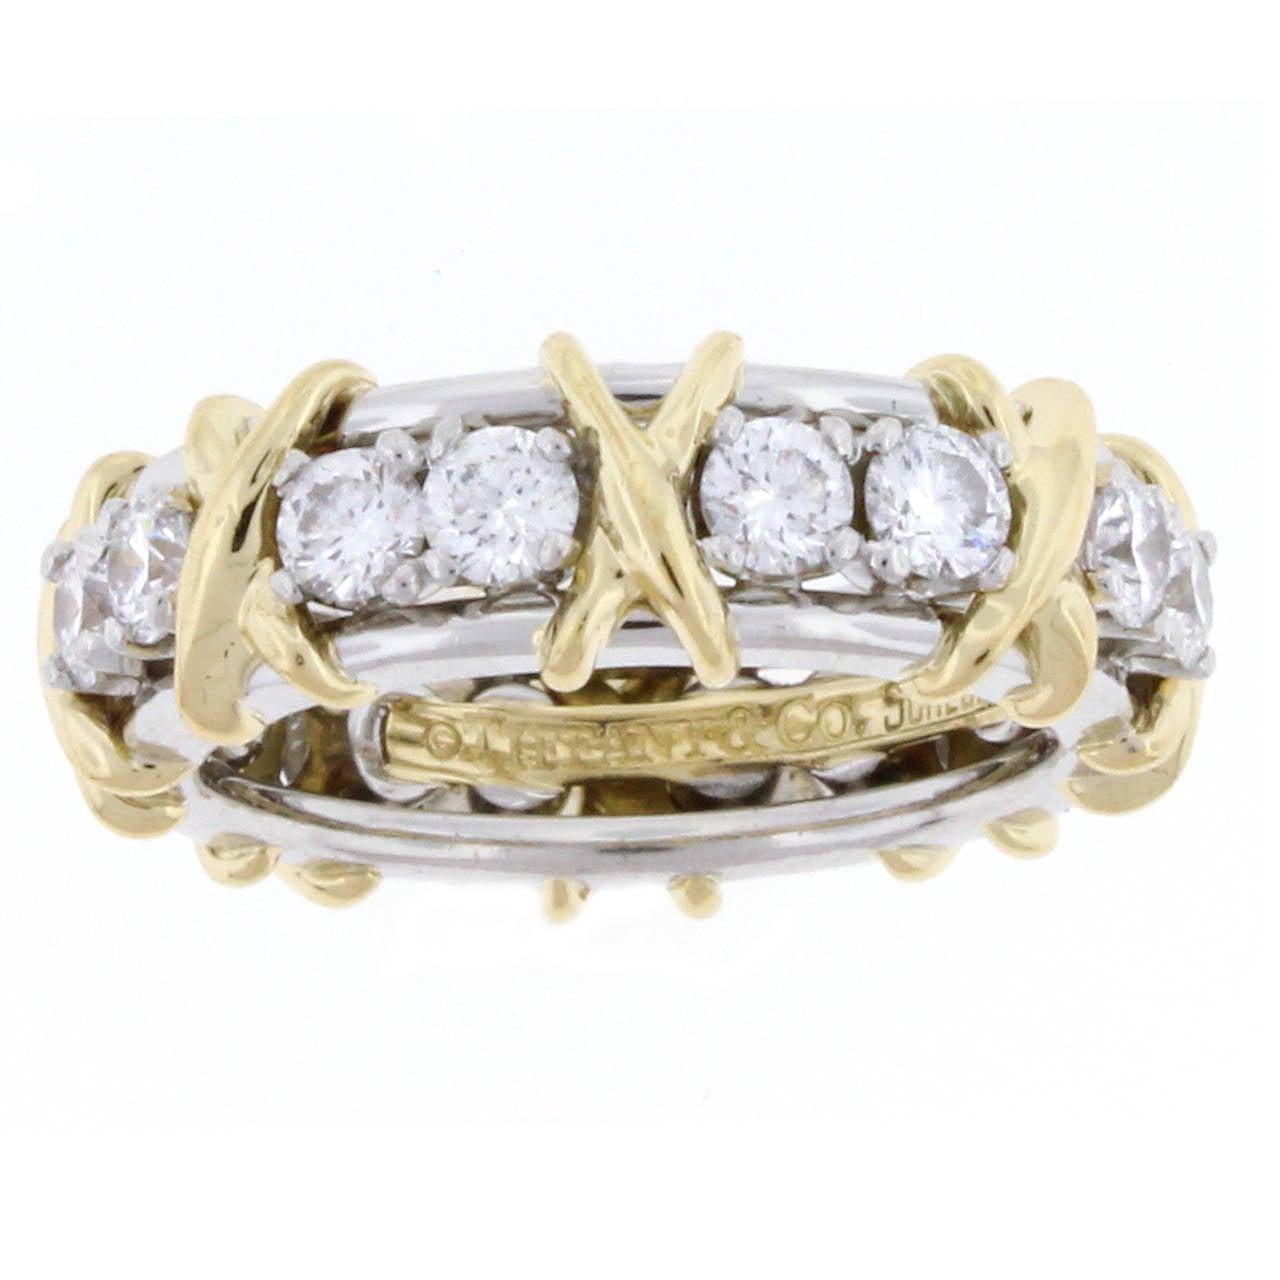 90c3b6eb3 Tiffany & Co. Schlumberger's 16 Stone Diamond Gold Platinum